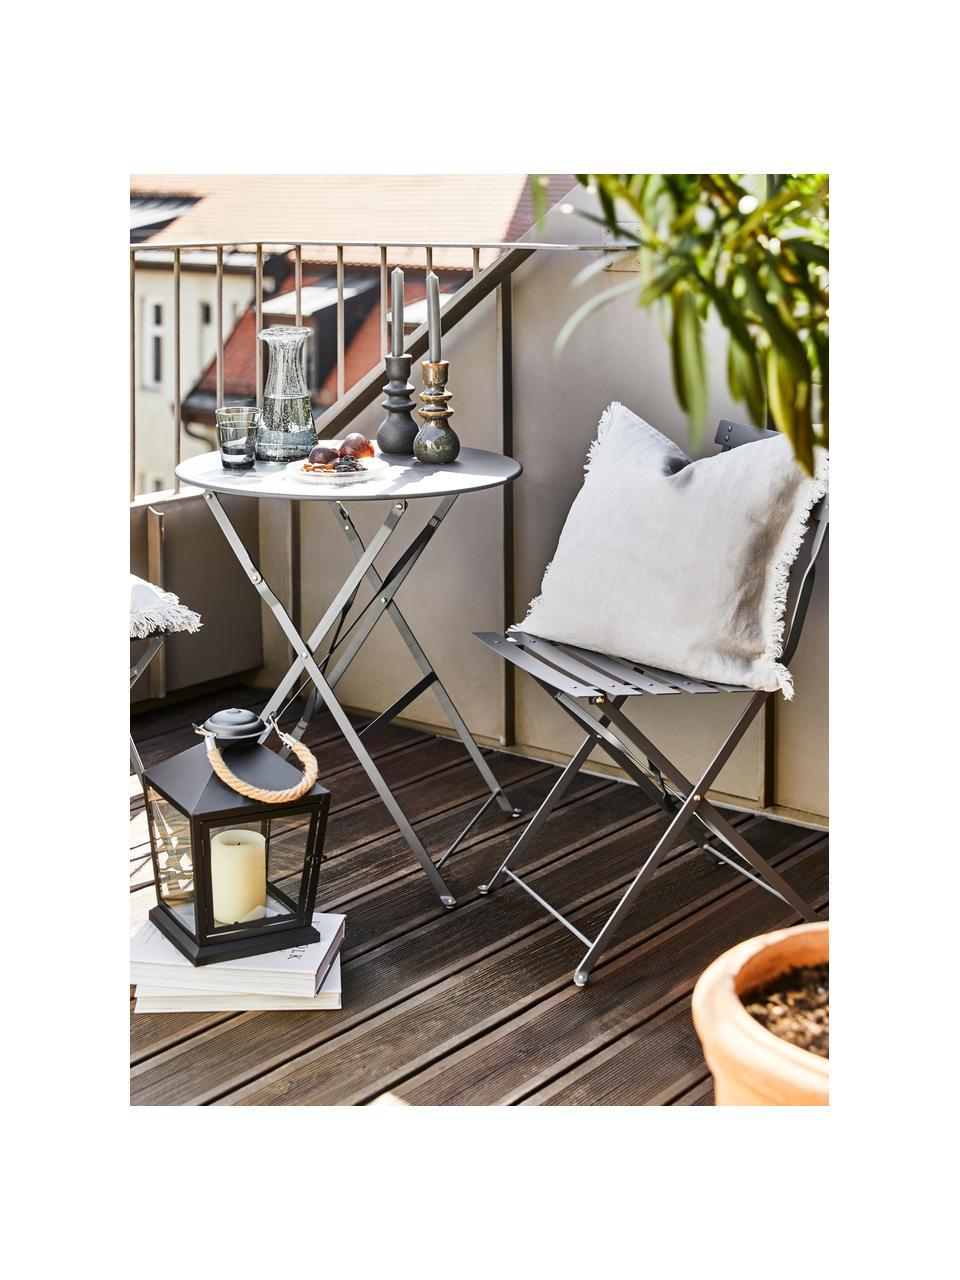 Balkon-Set Chelsea aus Metall, 3-tlg., Metall, pulverbeschichtet, Dunkelgrau, Sondergrößen